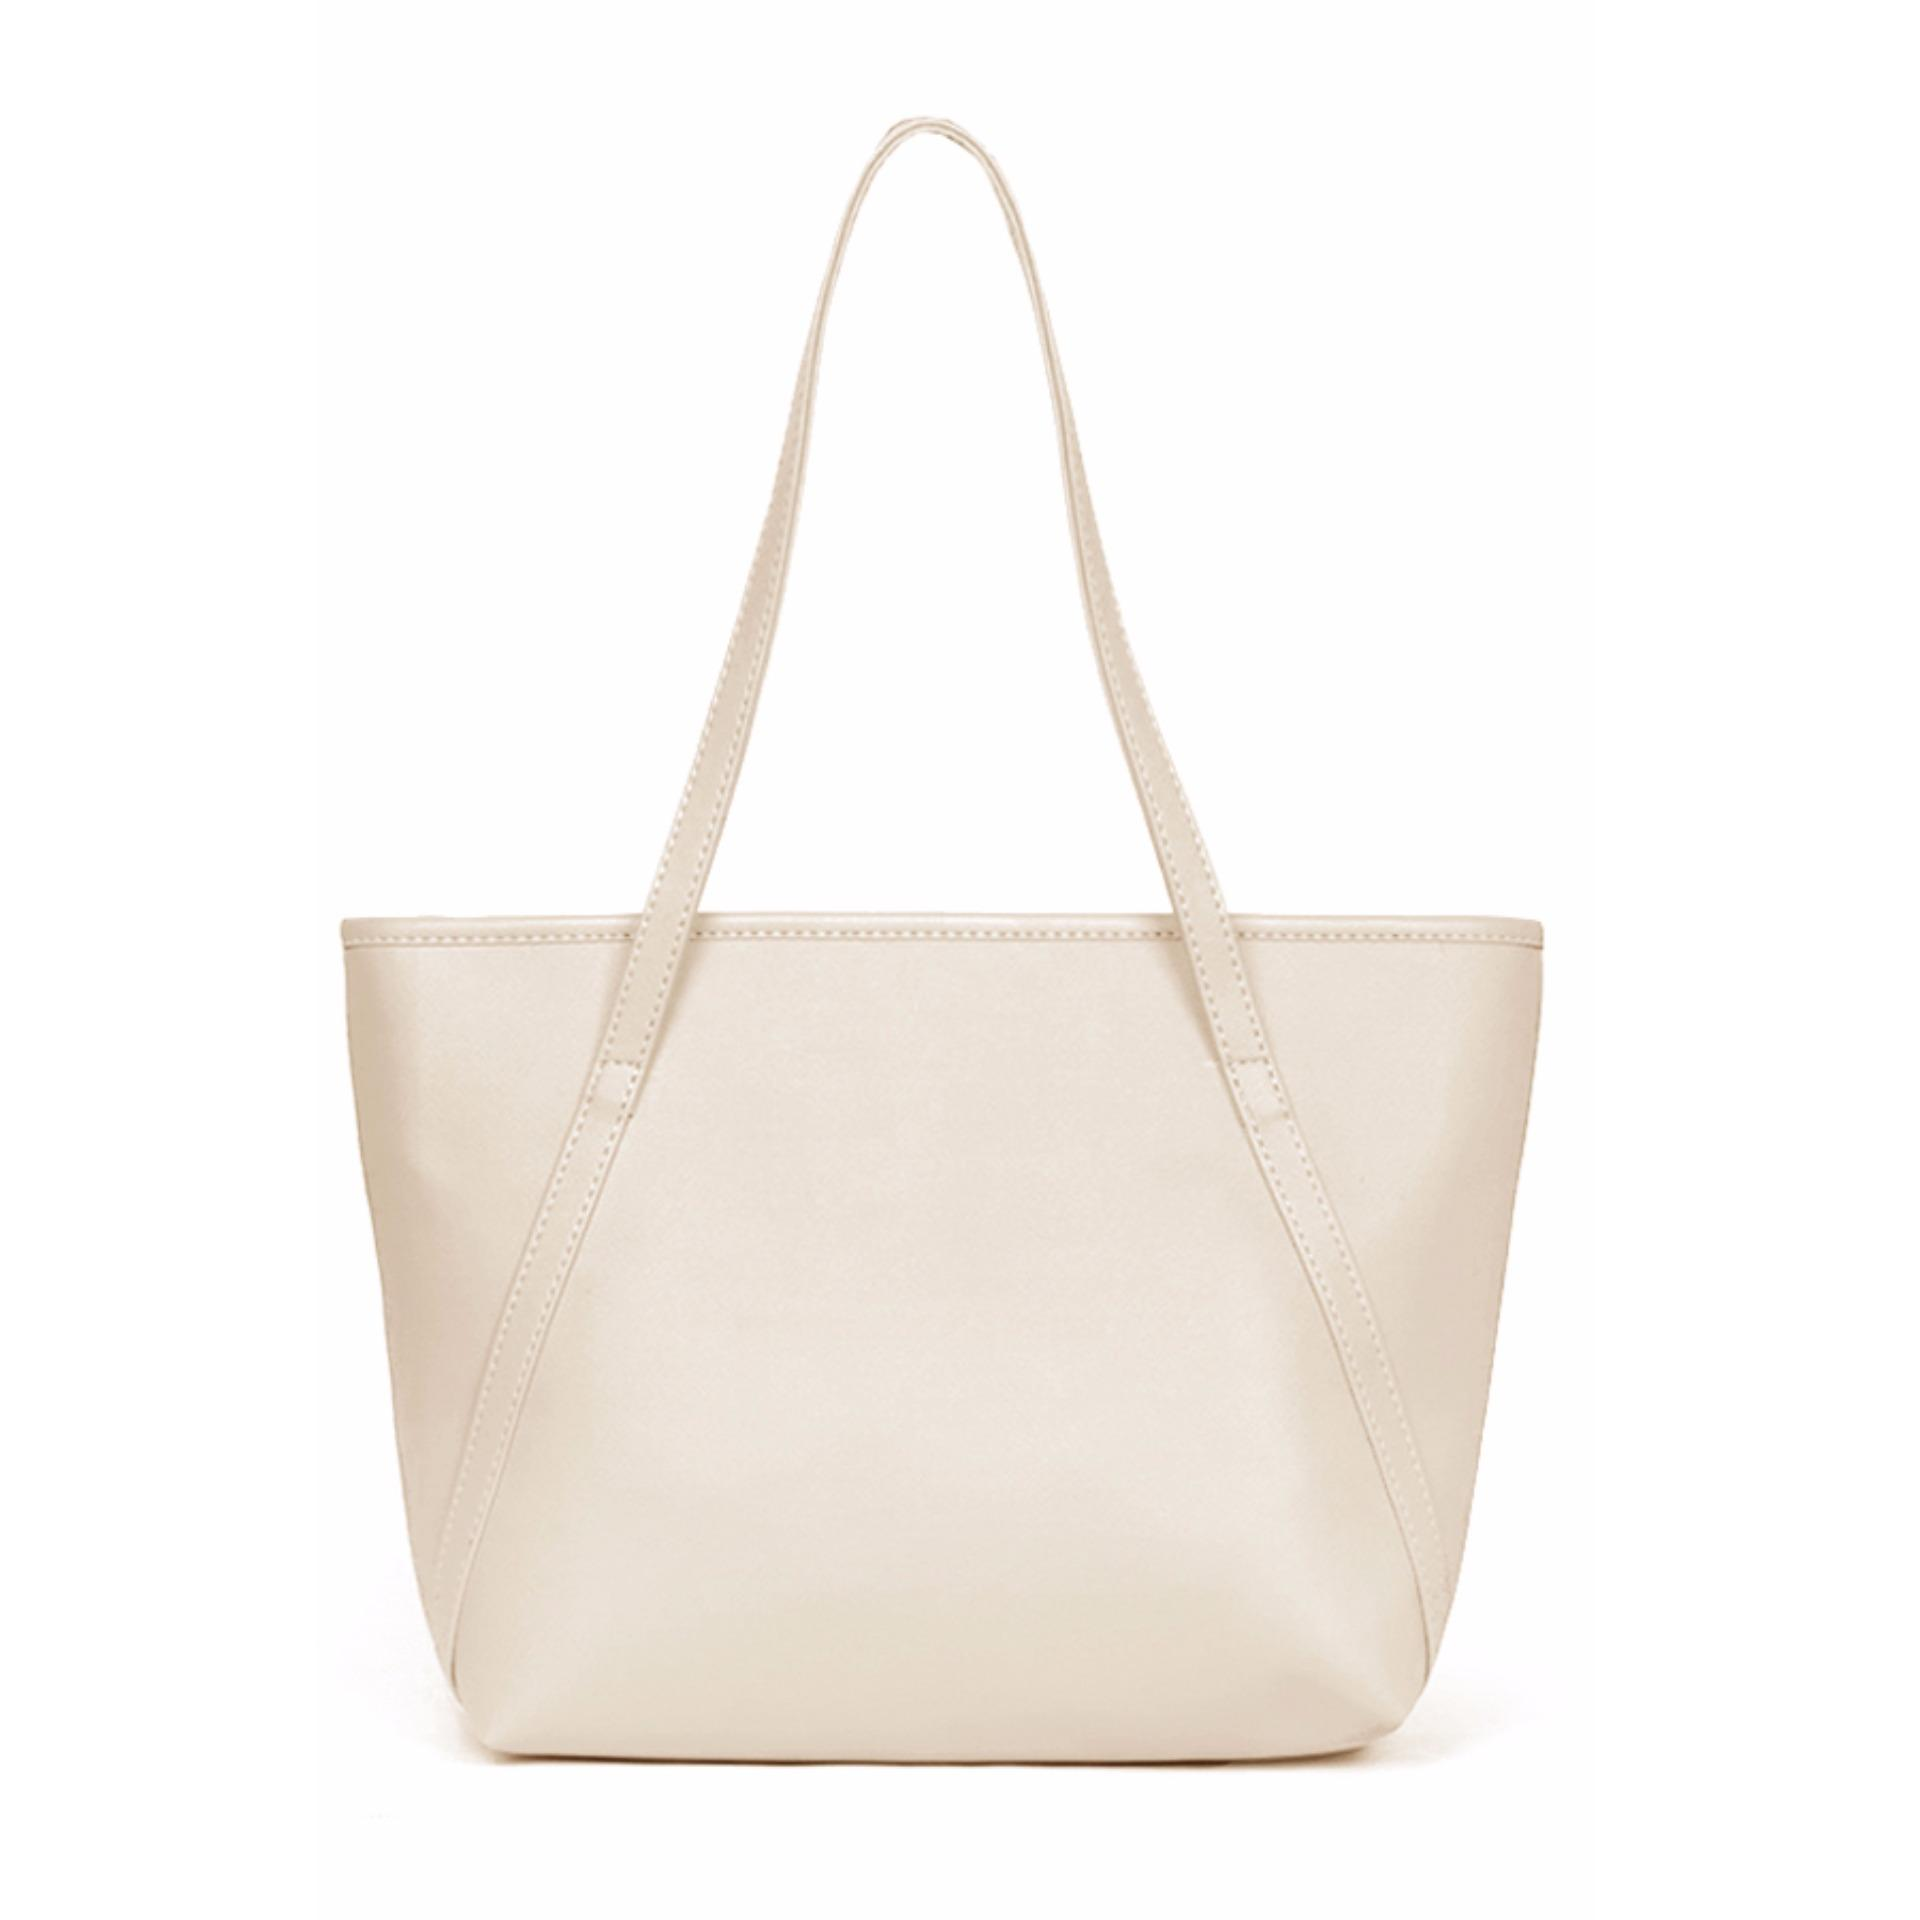 ... Free Legging Footless Black. Source ... QuincyLabel Tas Wanita Women Fashion PU Tote Leather Handbags Shoulder Bags - Beige .